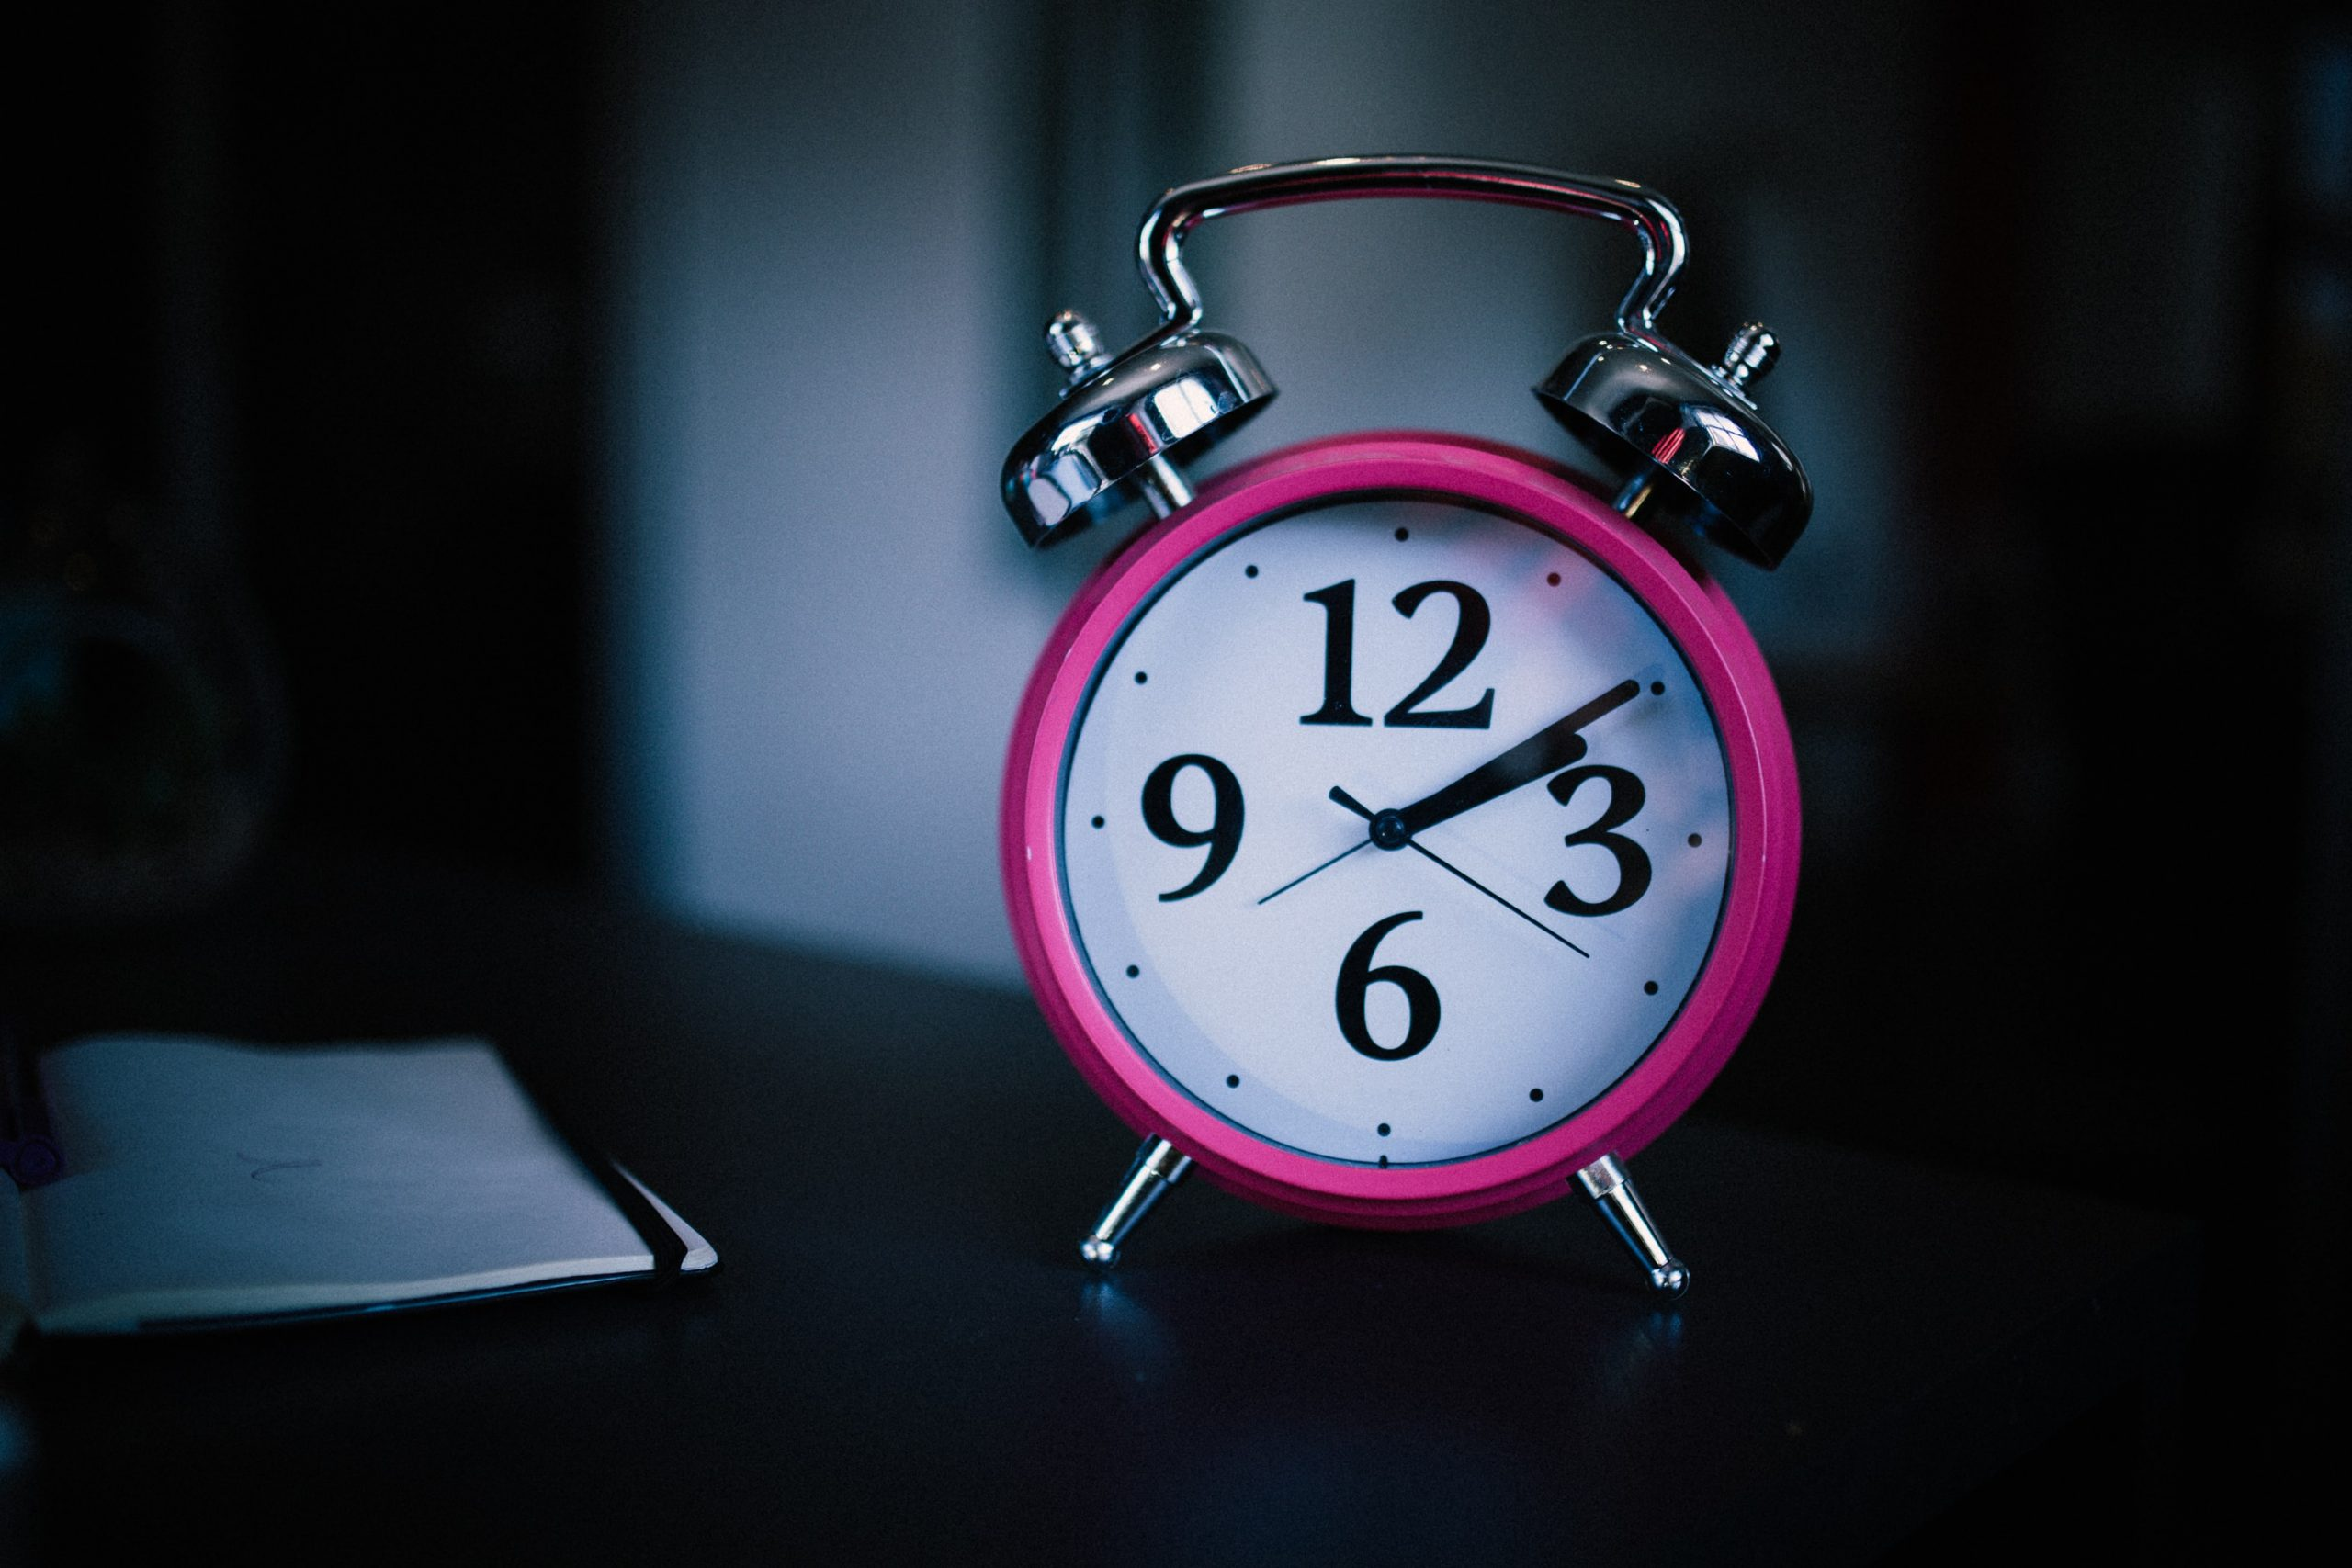 A close up photograph of a traditional pink analogue alarm clock.